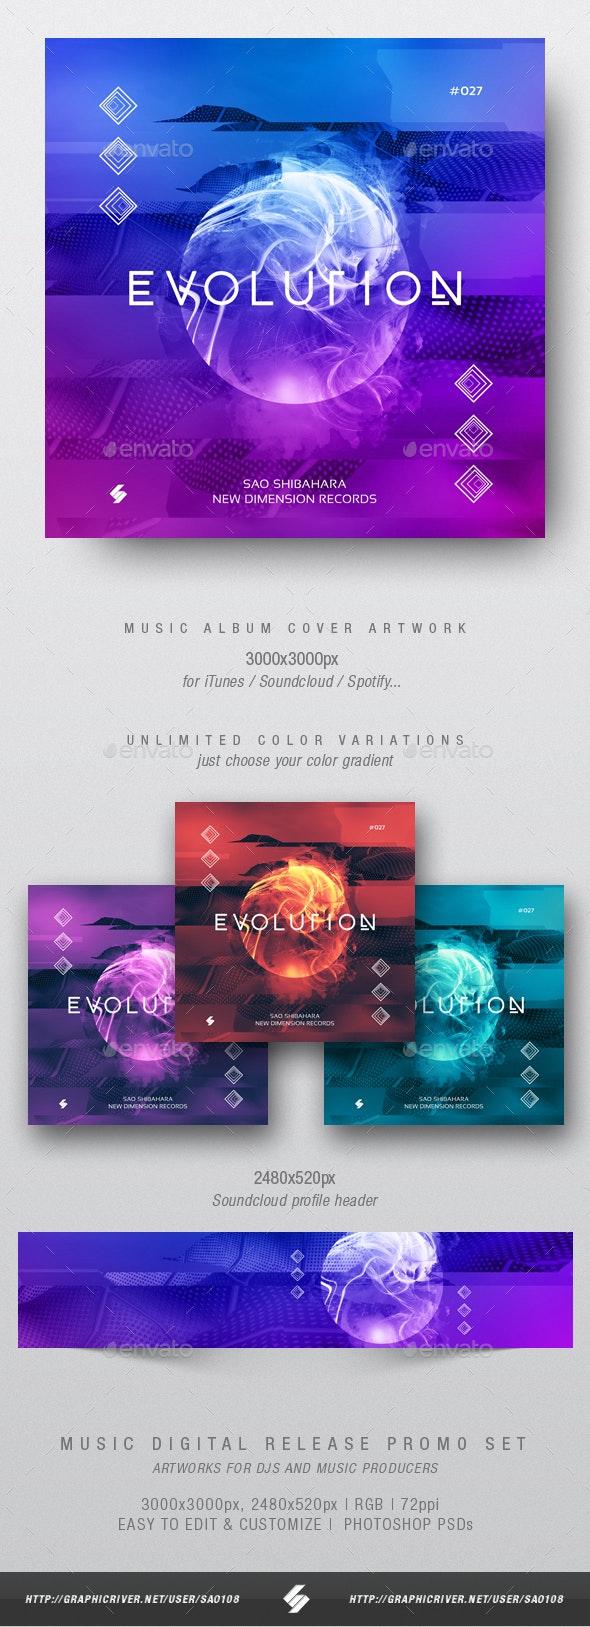 Evolution - Electronic Music Album Cover Artwork Template - Miscellaneous Social Media